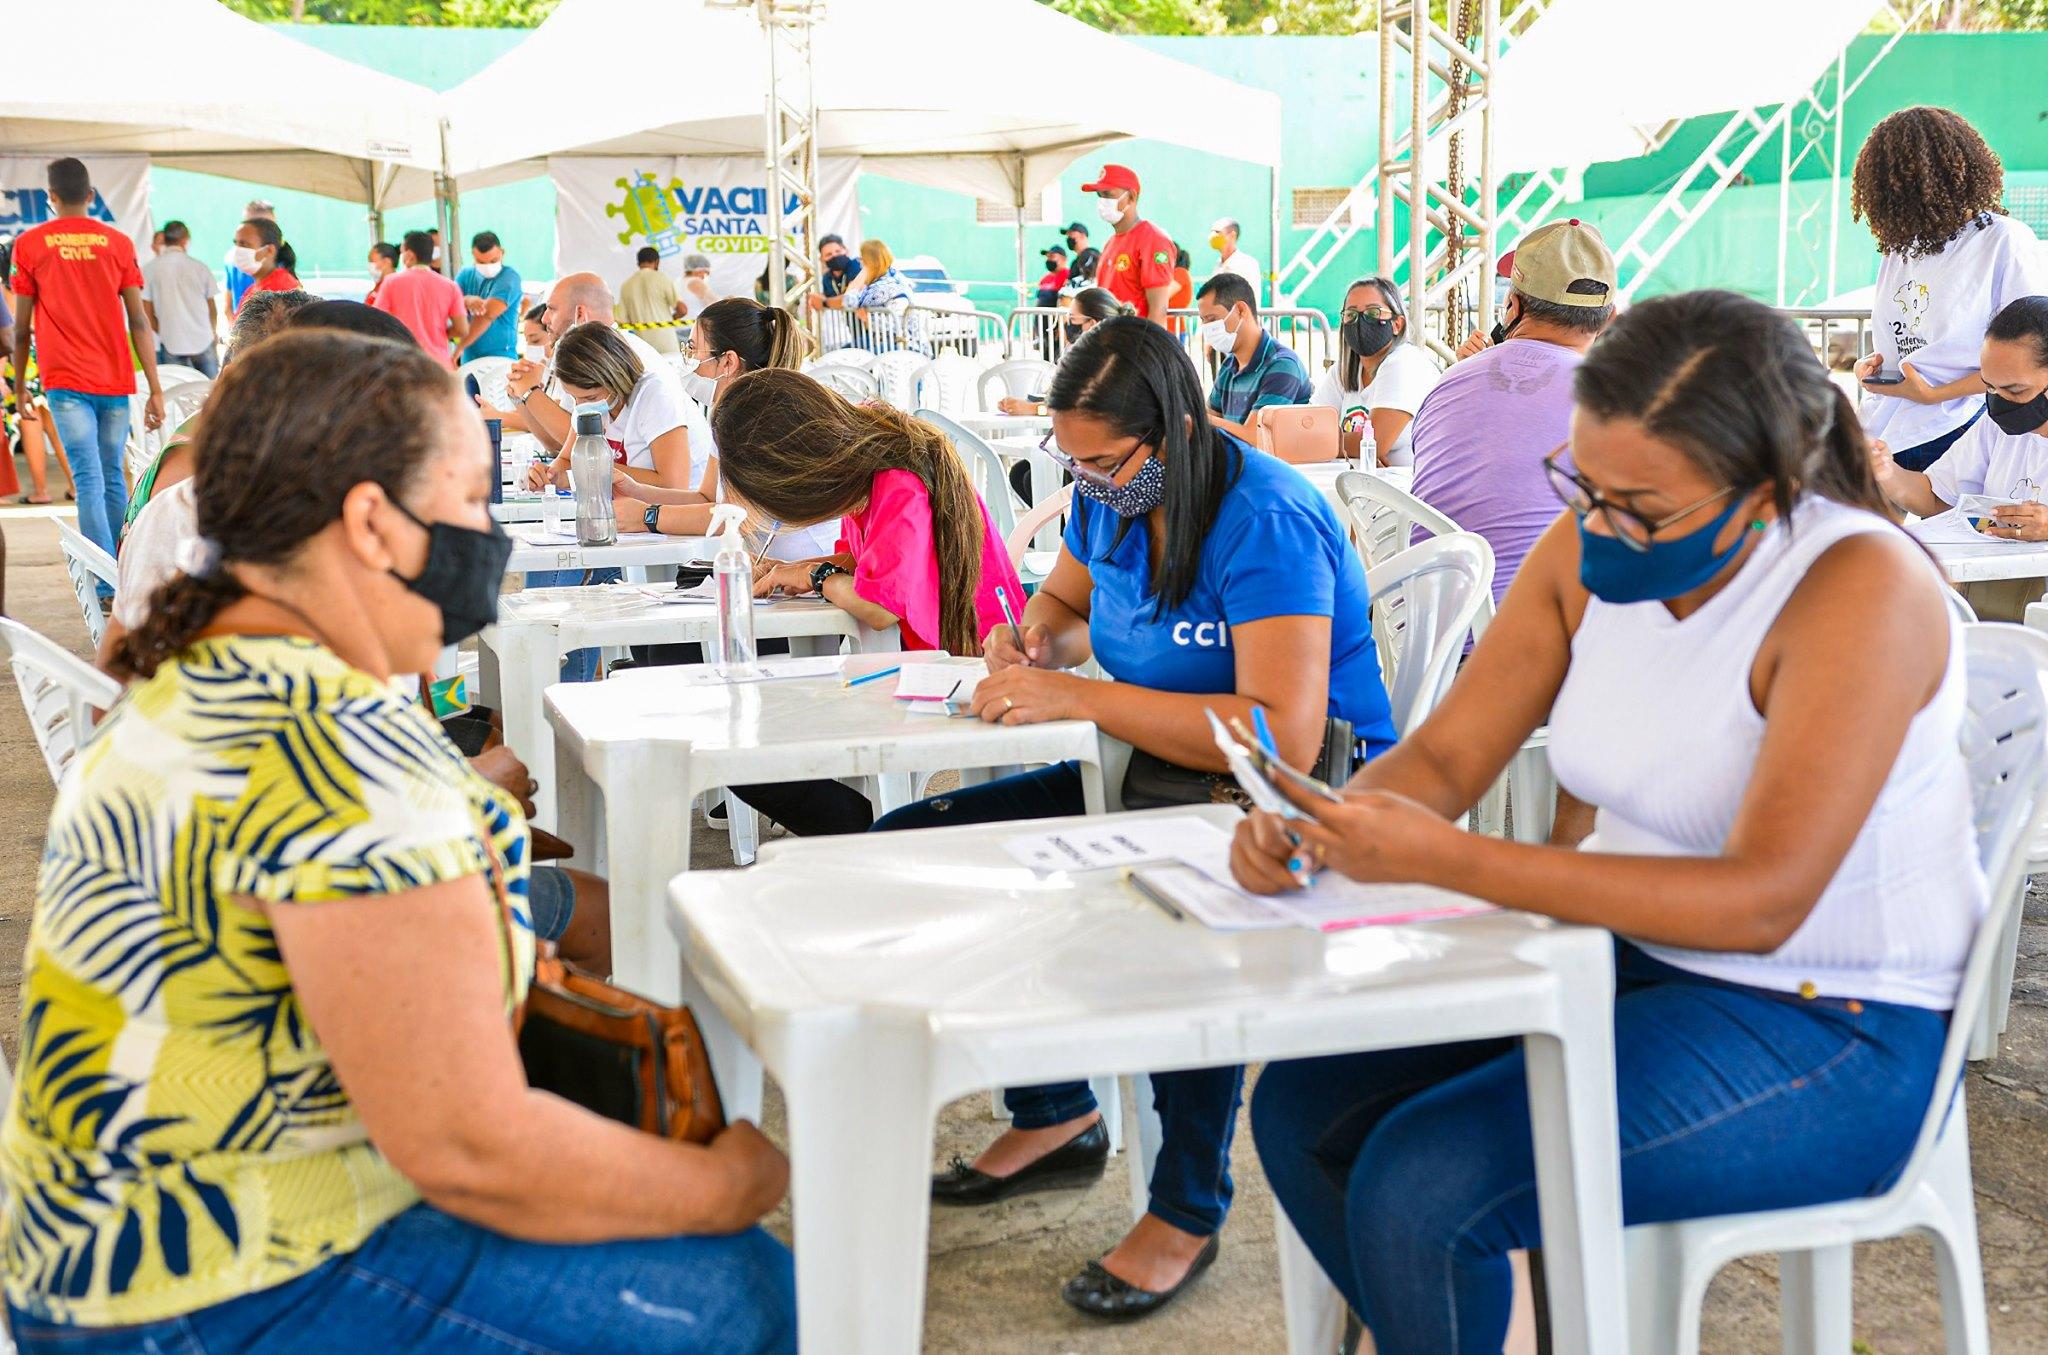 Após 24 horas de campanha, Santa Rita supera 100 mil doses aplicadas